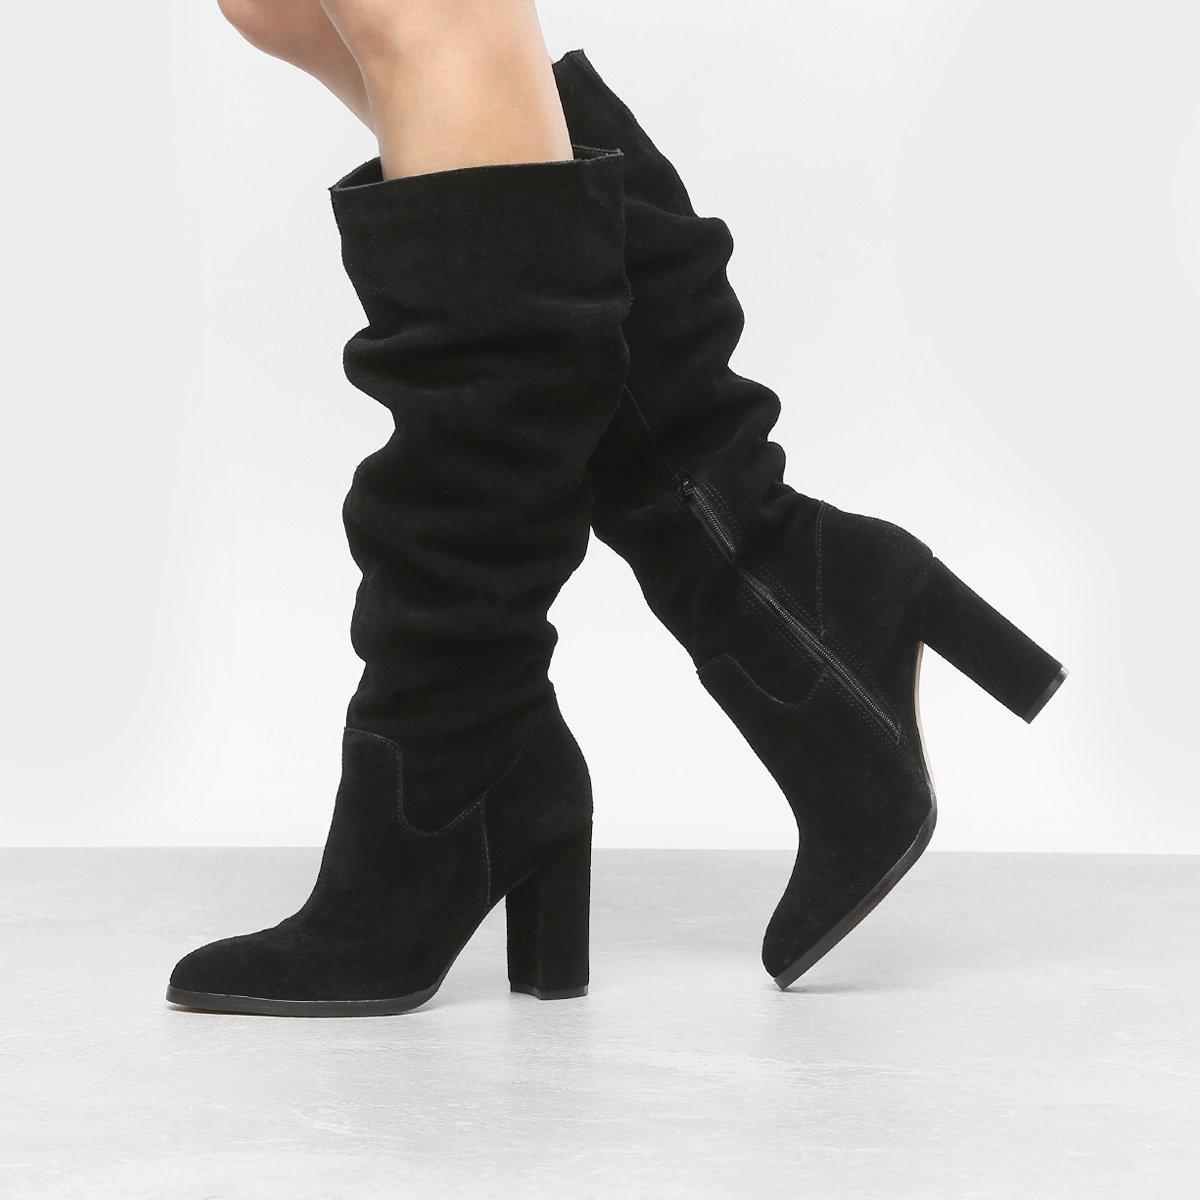 Grosso Feminina Shoestock Bota Couro Slouch Bota Couro Salto Preto xqYBwvHU